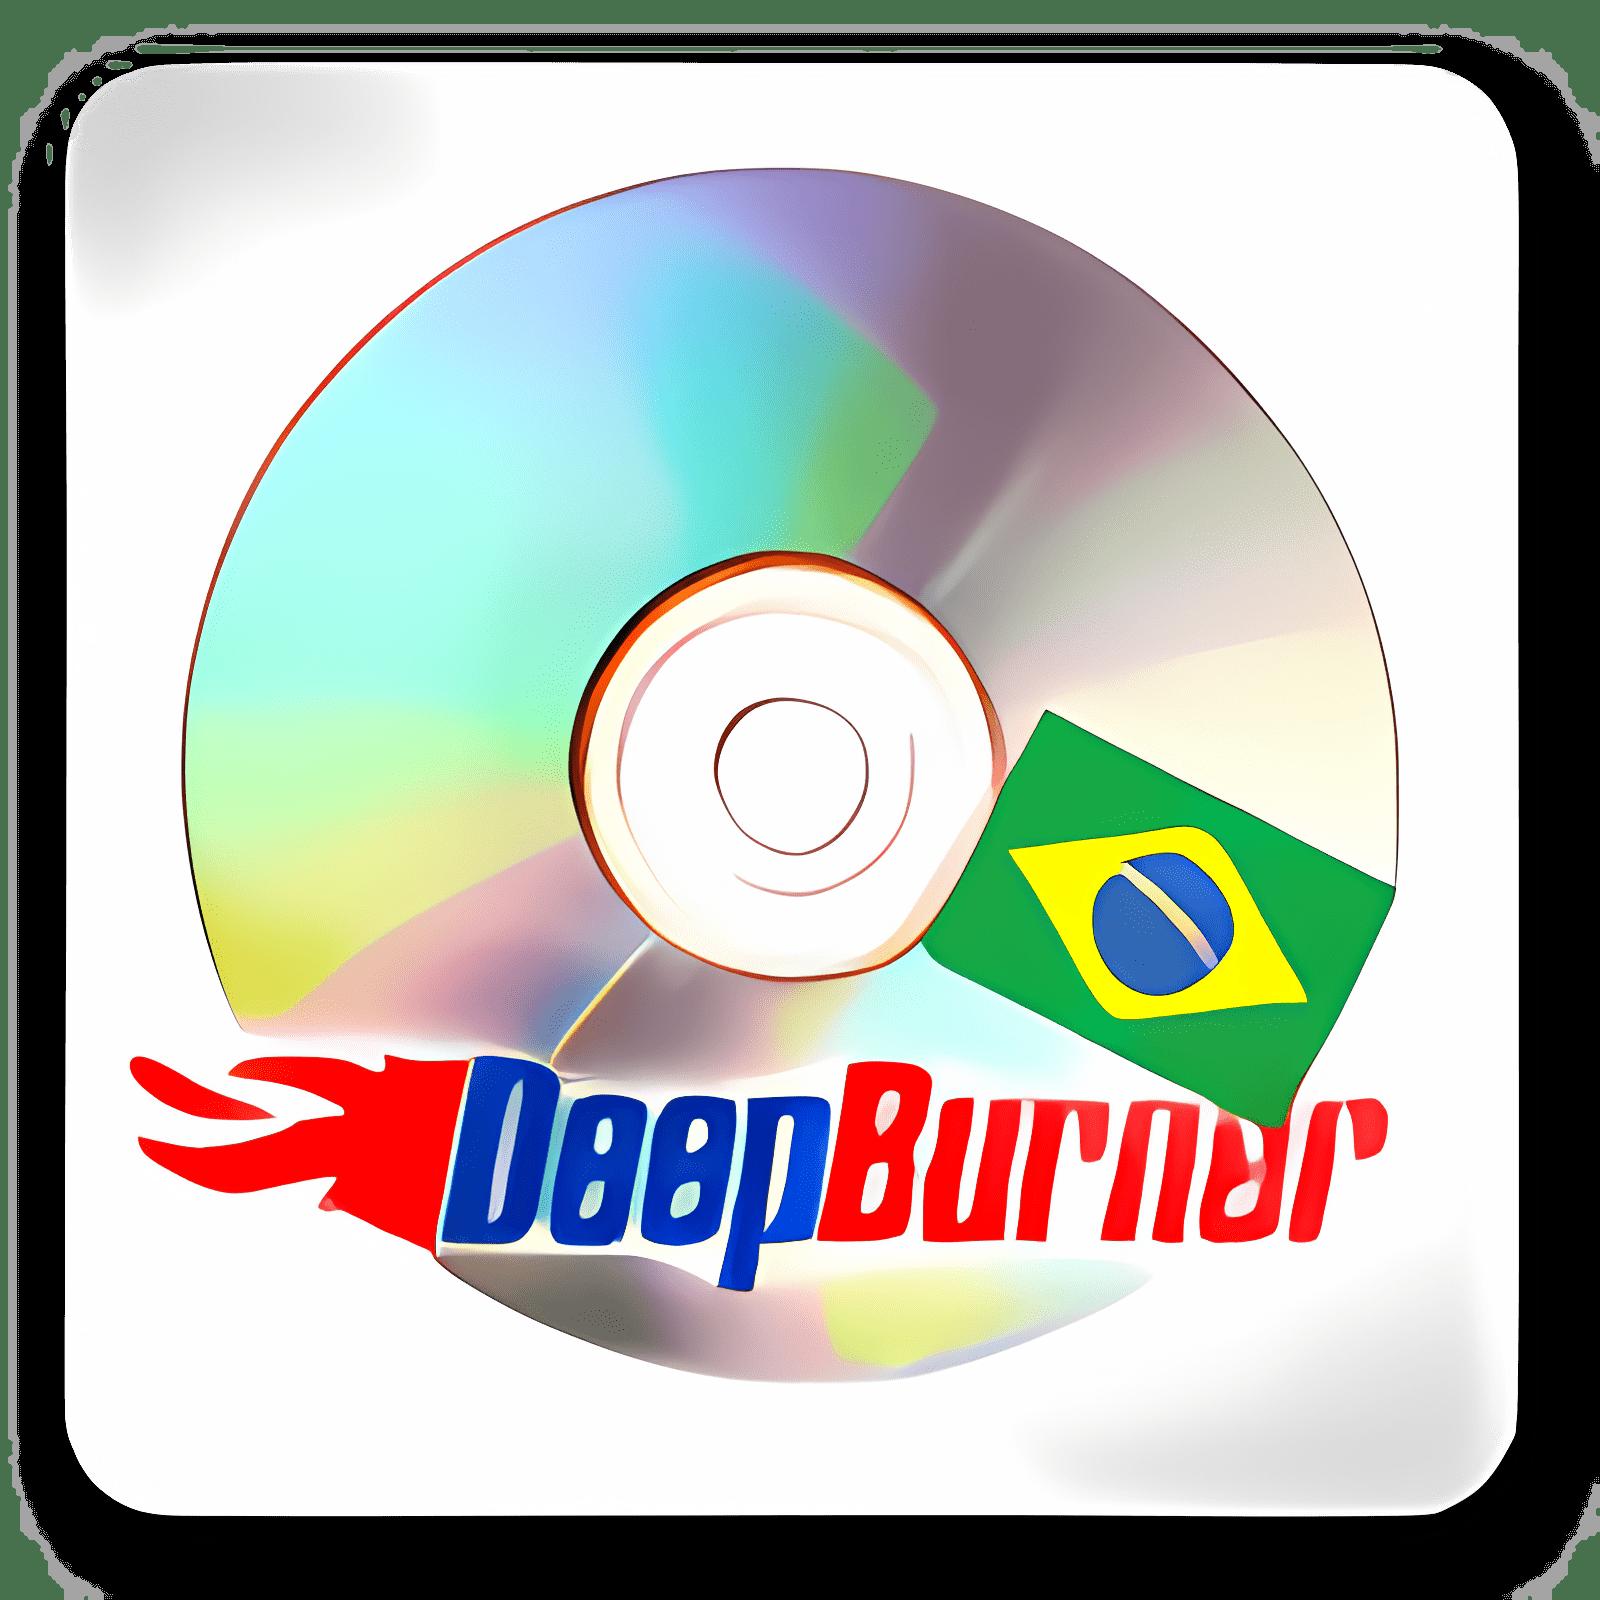 Português do Brasil para DeepBurner